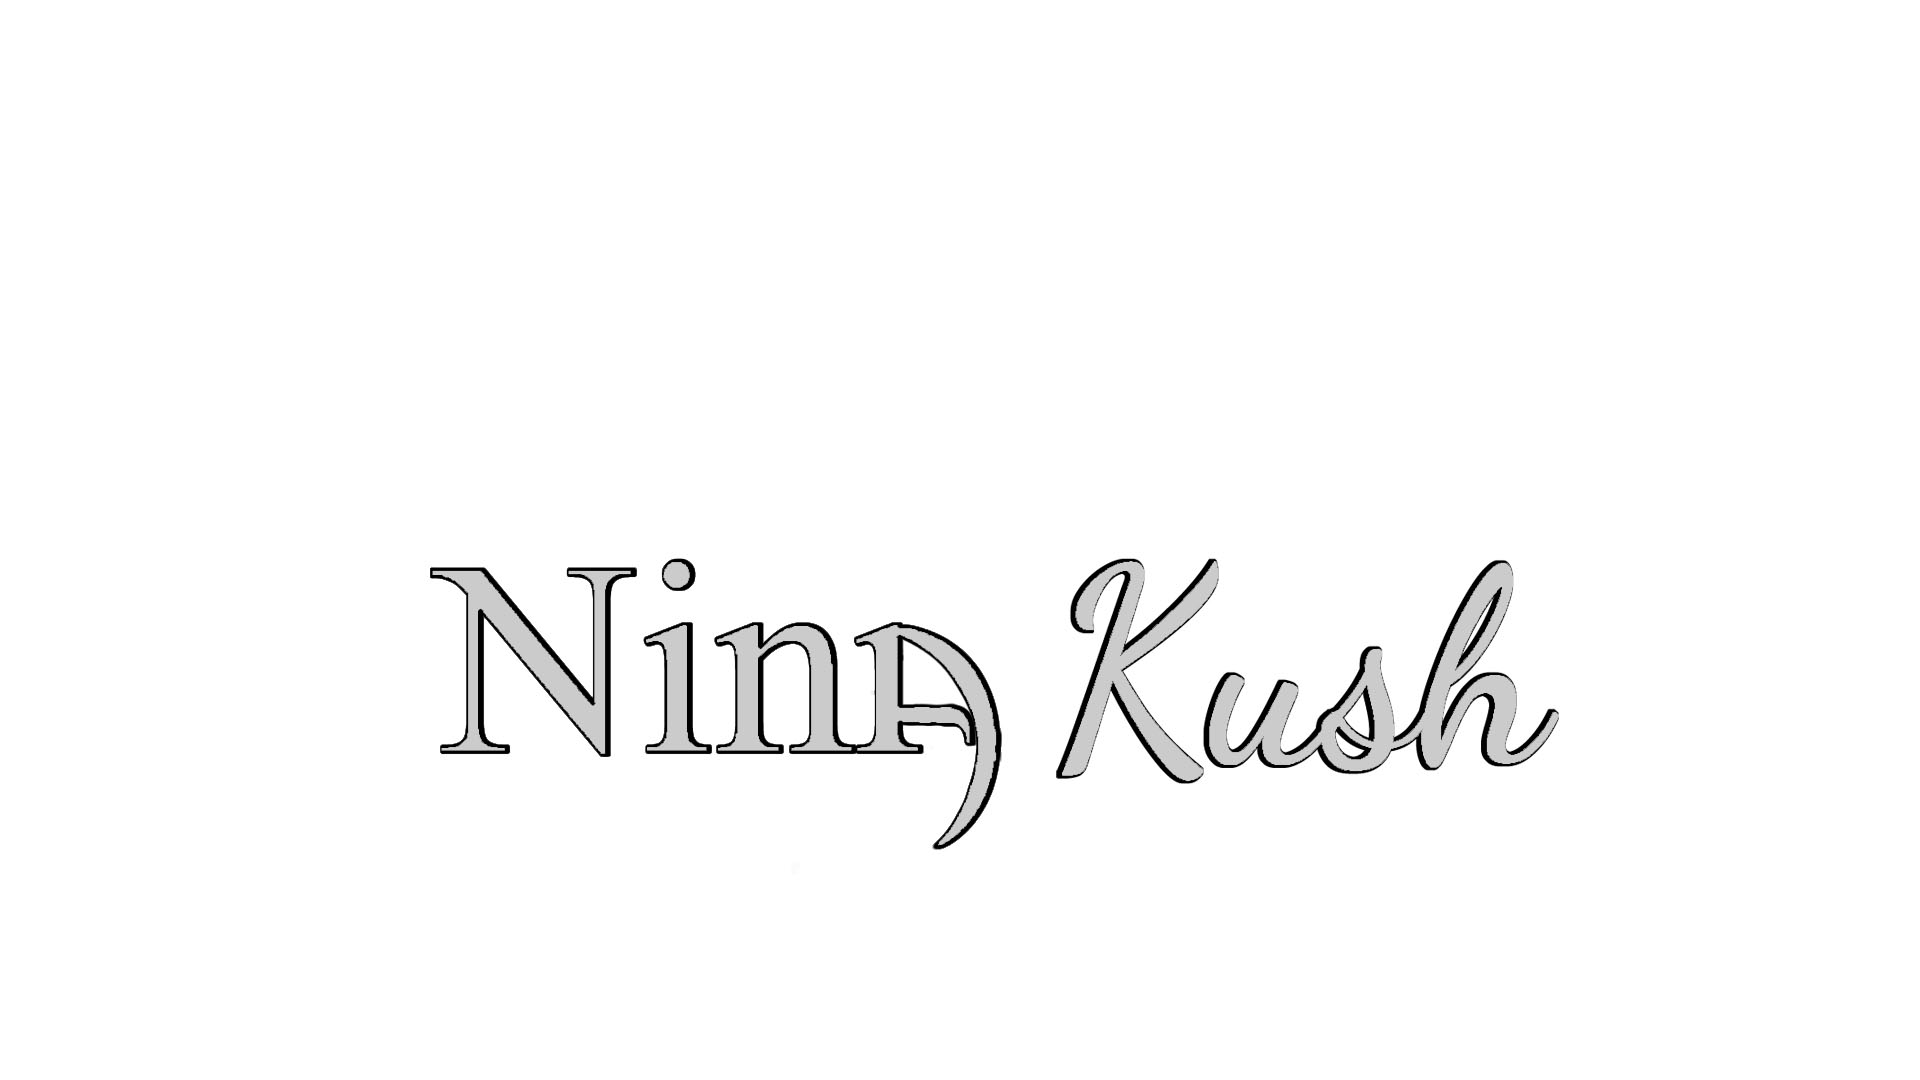 Логотип, товарный знак. Далее разработка brend booka компани фото f_0175ce329684b9dc.jpg